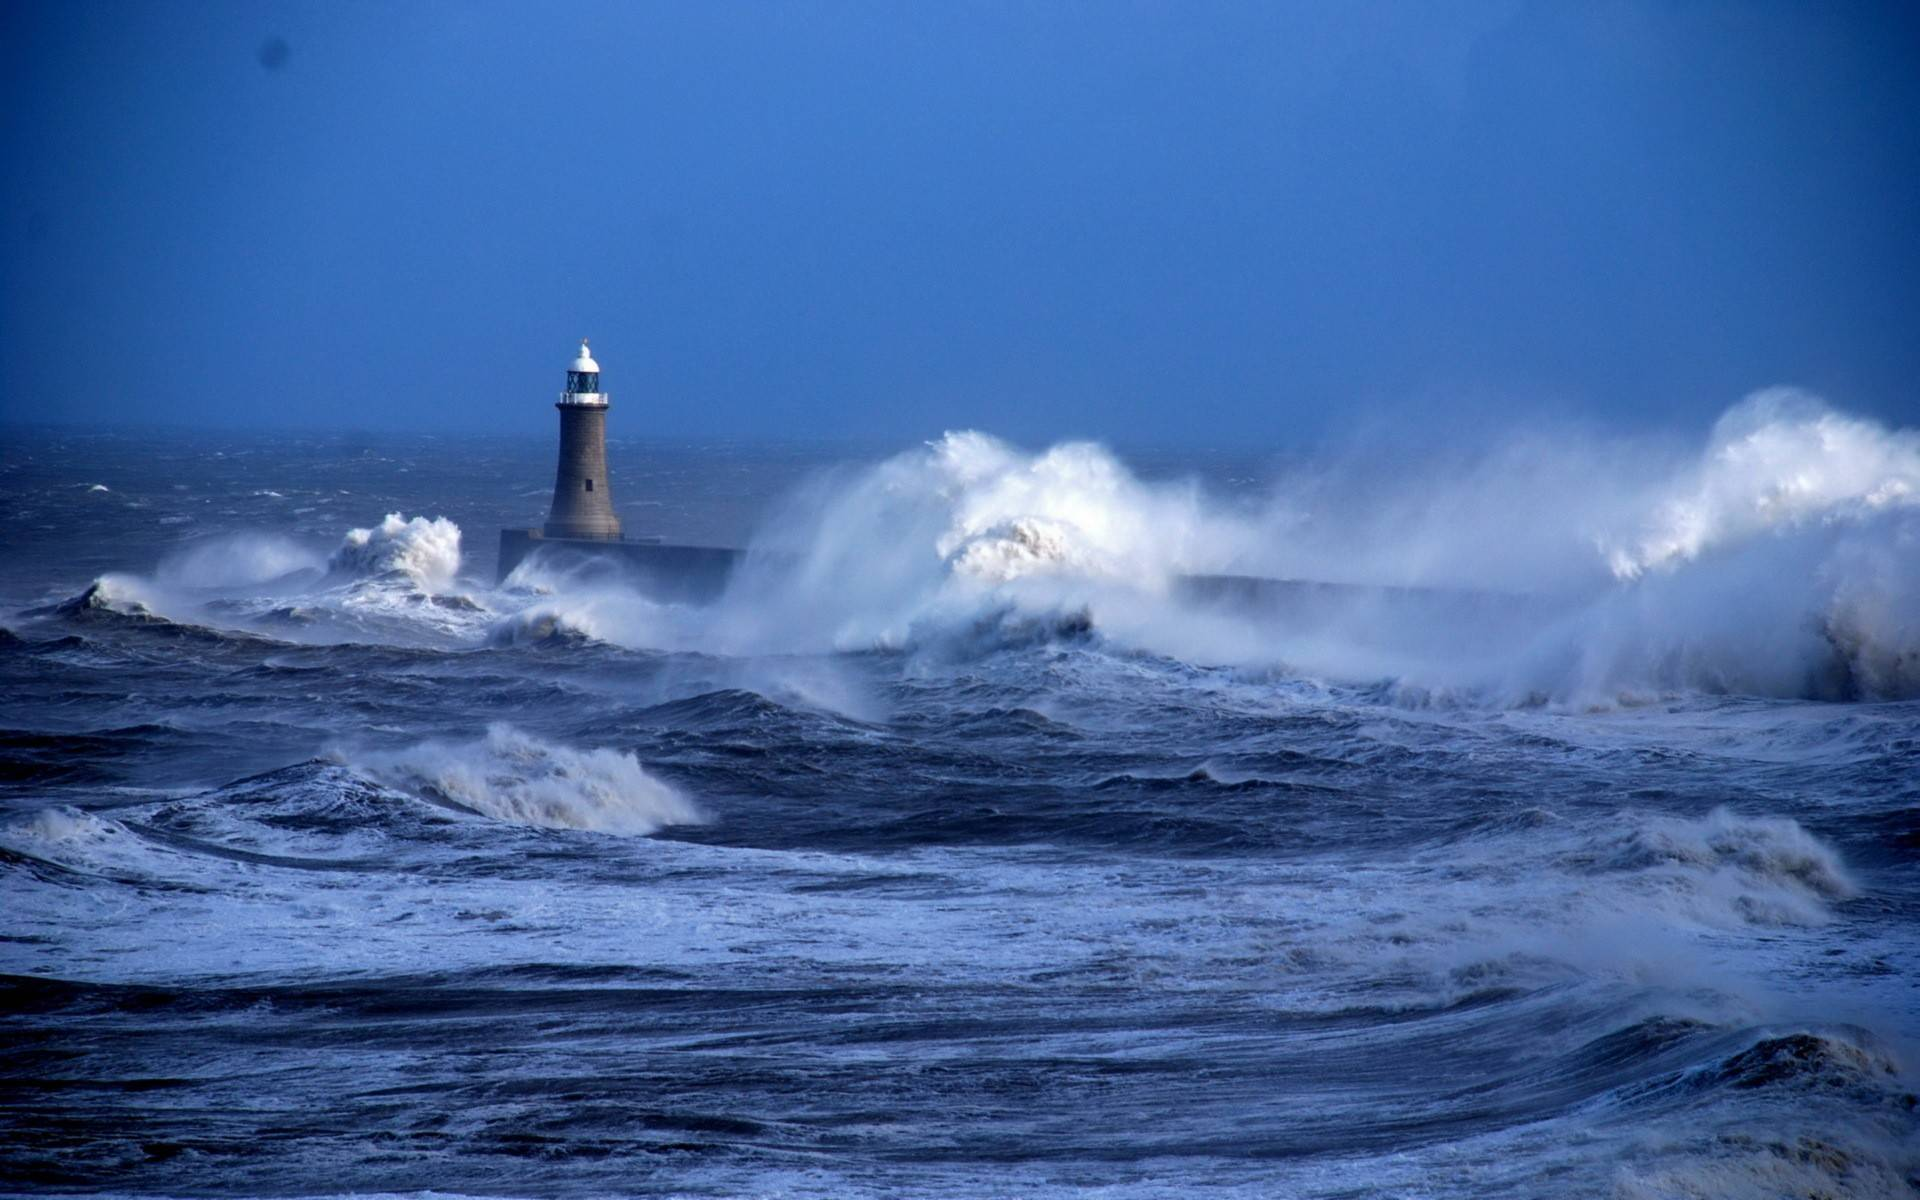 Ocean Waves 19201200 Wallpaper 1668789 1920x1200